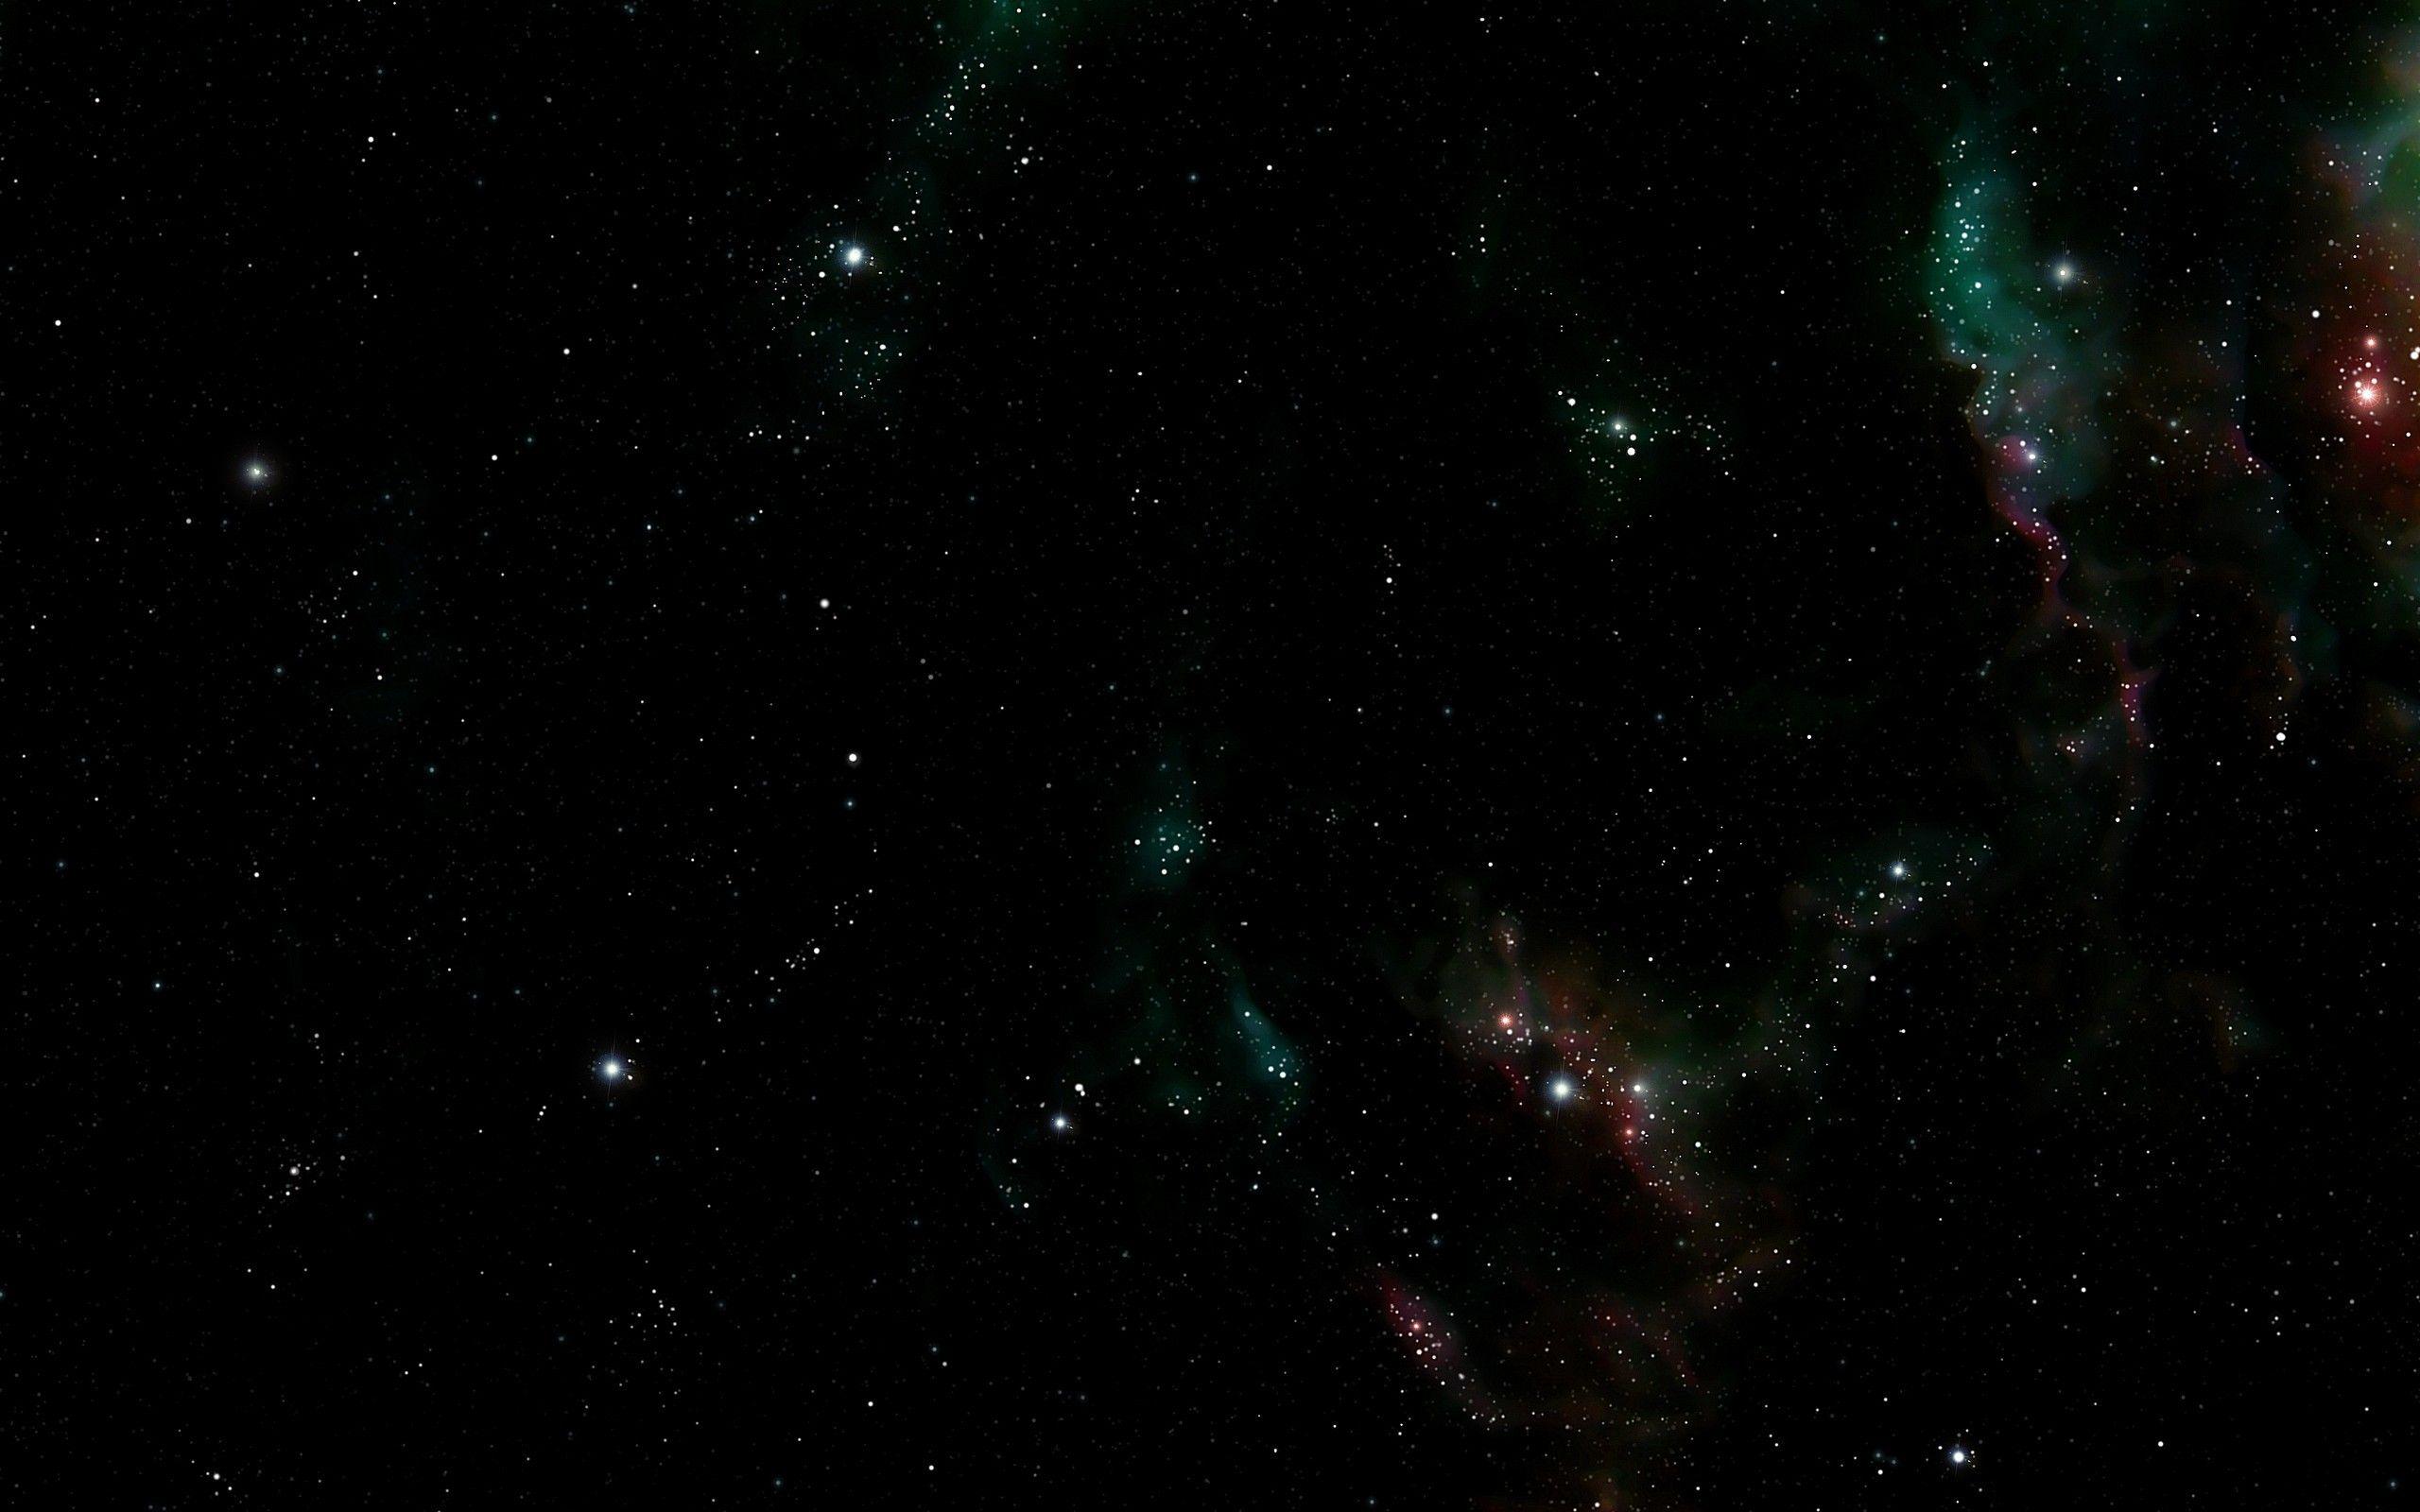 Widescreen Wallpaper Dark Outer Space Stars 2560x1600 Via